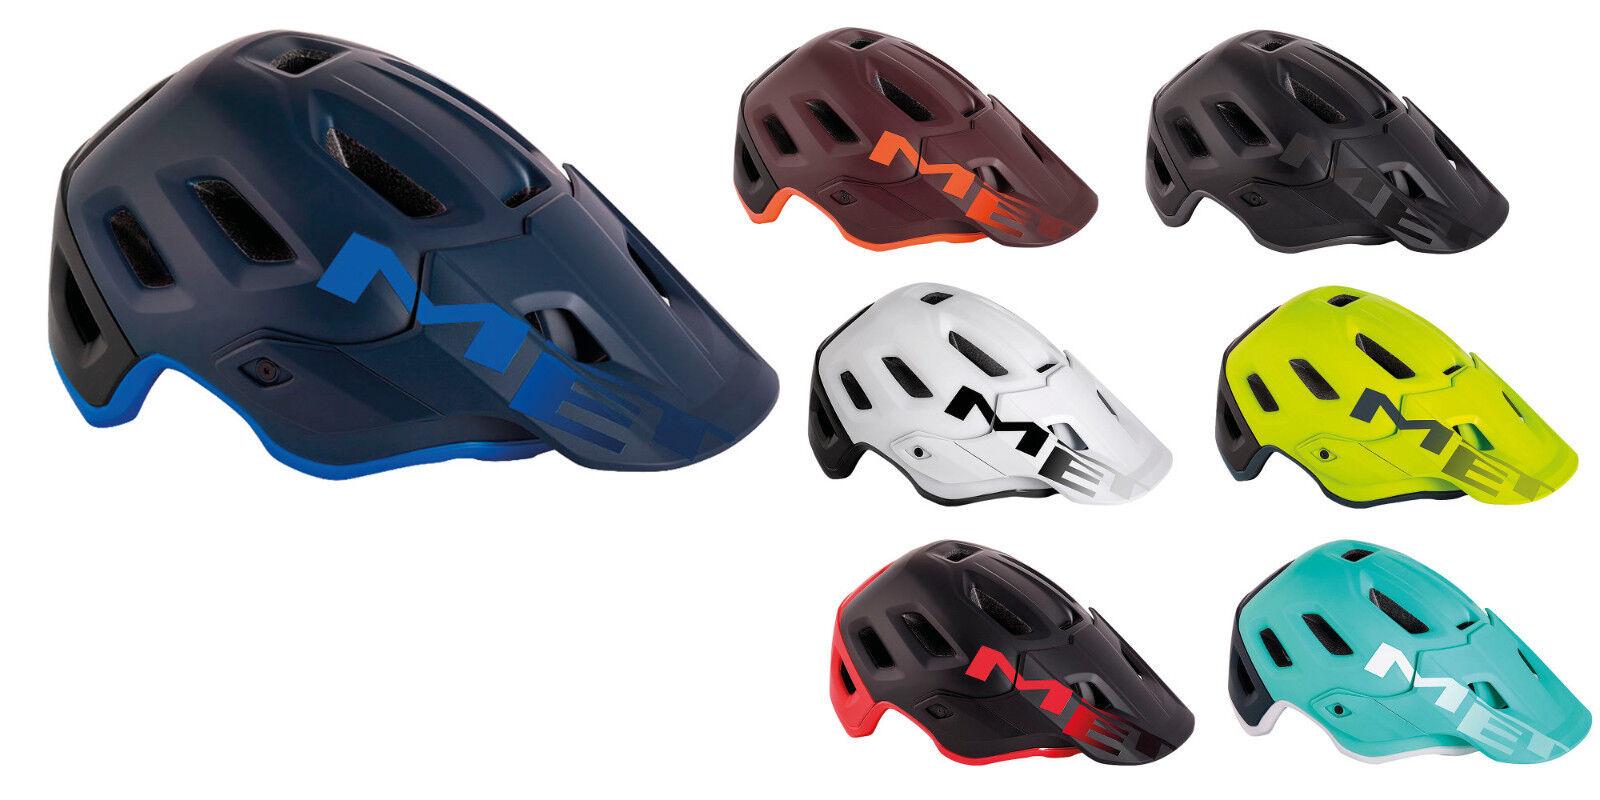 Met Casco Bicicleta Roam Modelo 2018 All-Mountainhelm Enduro Montaña de la Bici